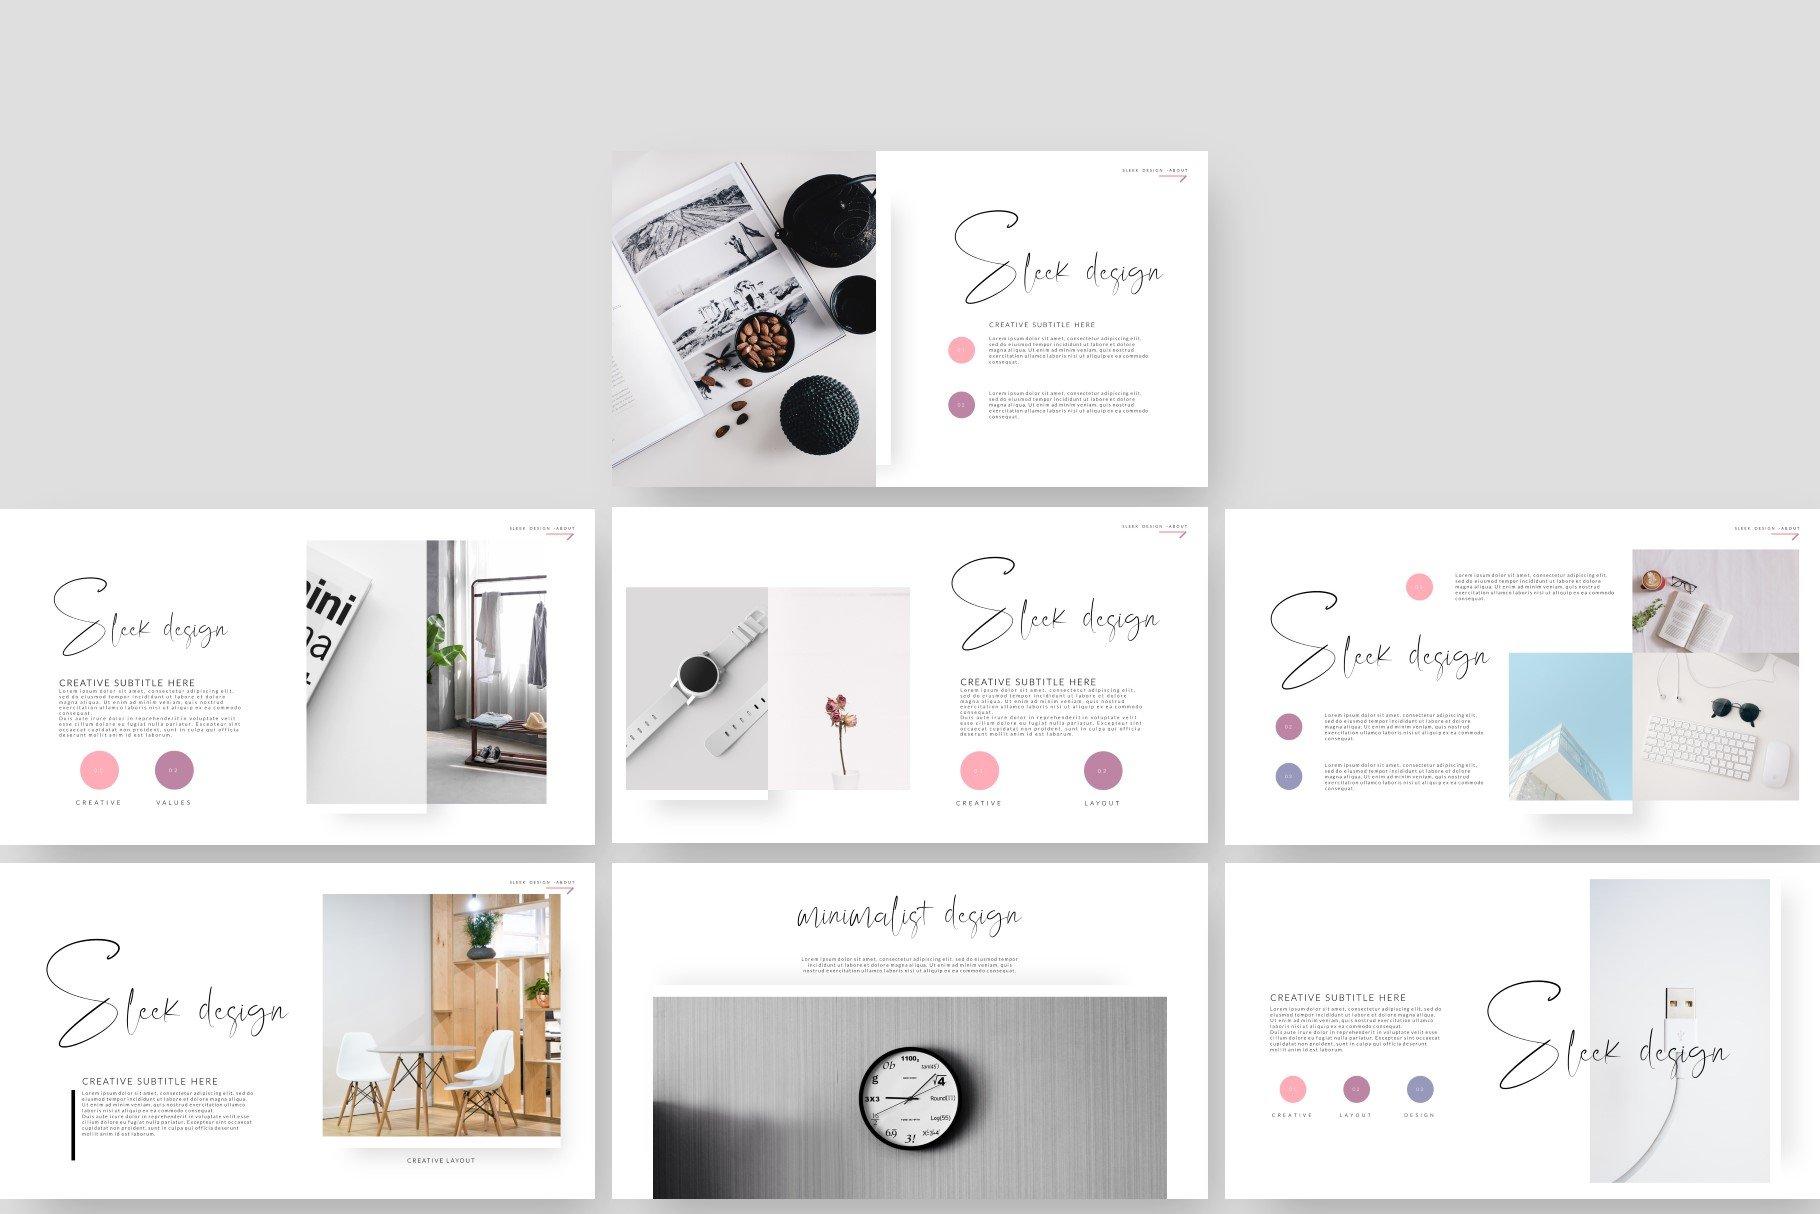 Sleek design ptc3